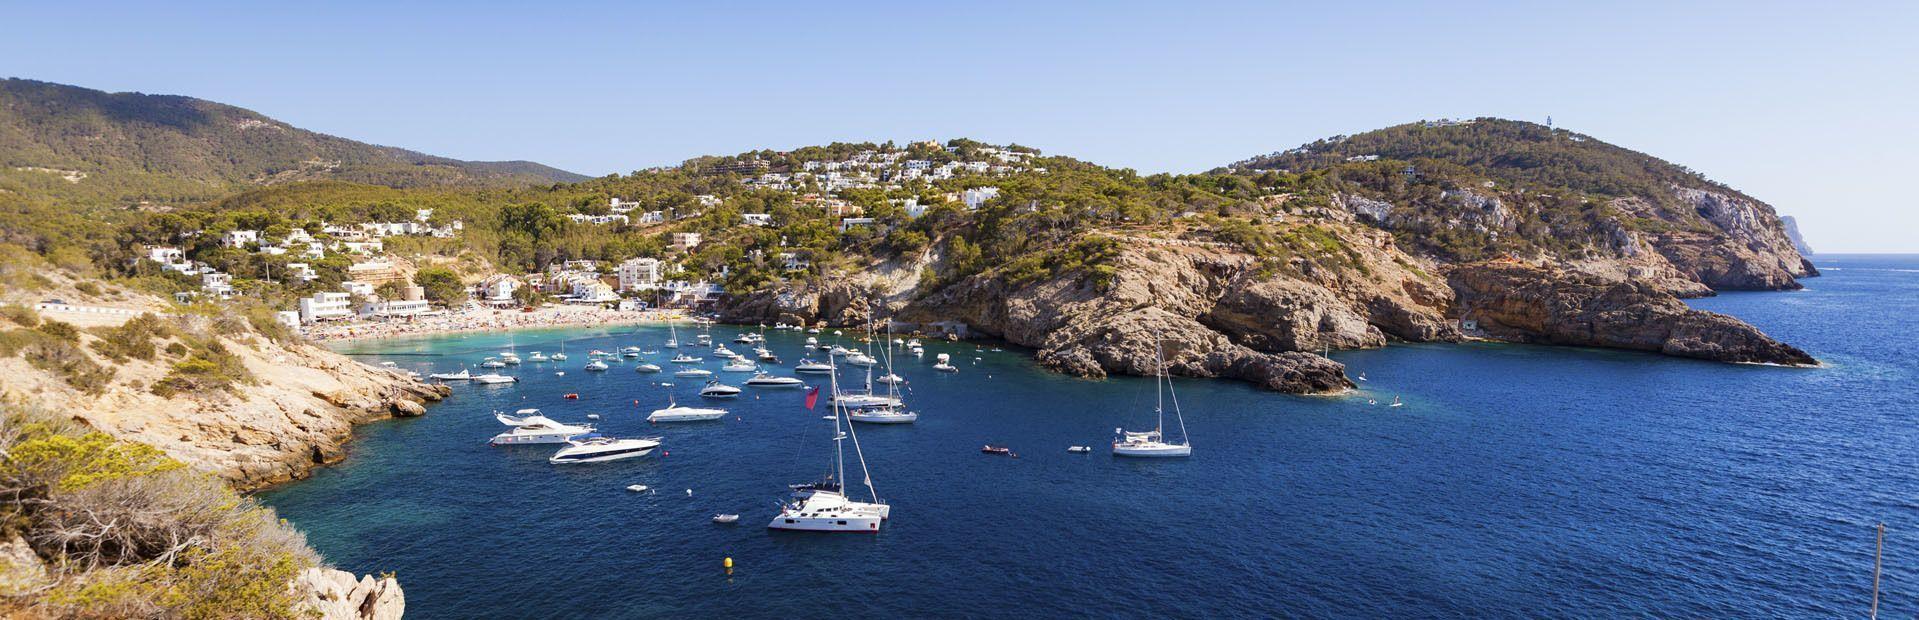 Islas Baleares: Beach Life & Island Discovery